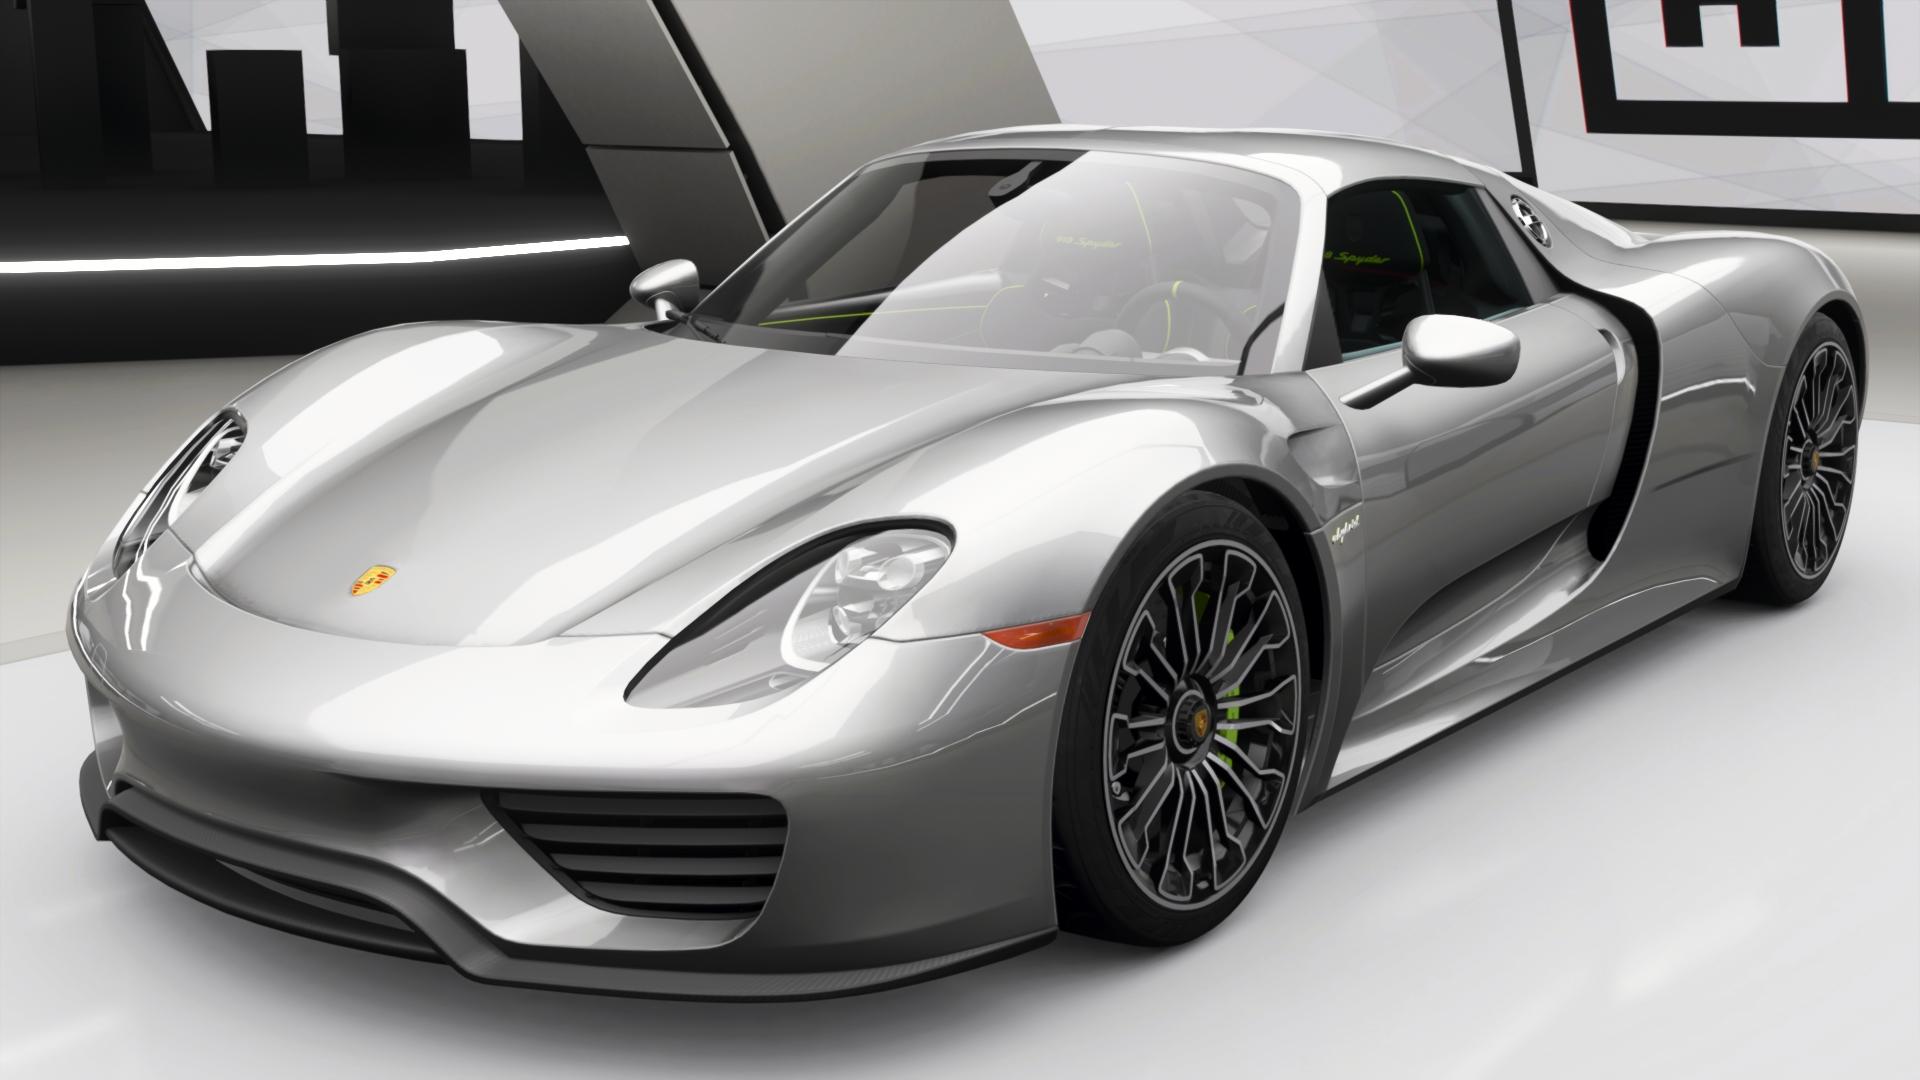 Porsche 918 Spyder Forza Motorsport Wiki Fandom Powered By Wikia